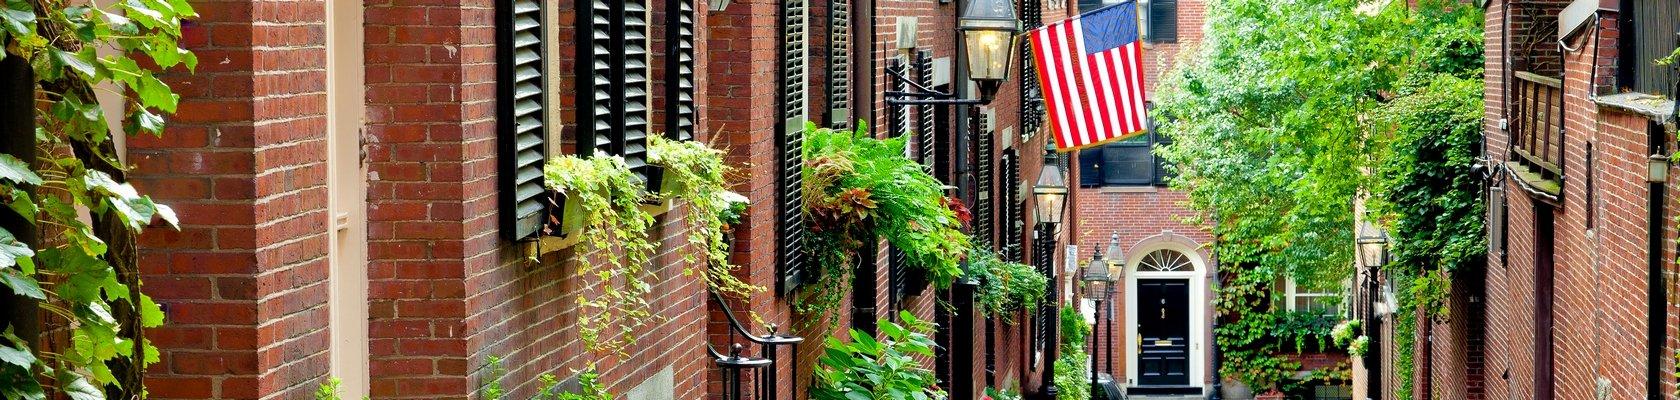 Eén van de oudste steden van Amerika, Boston